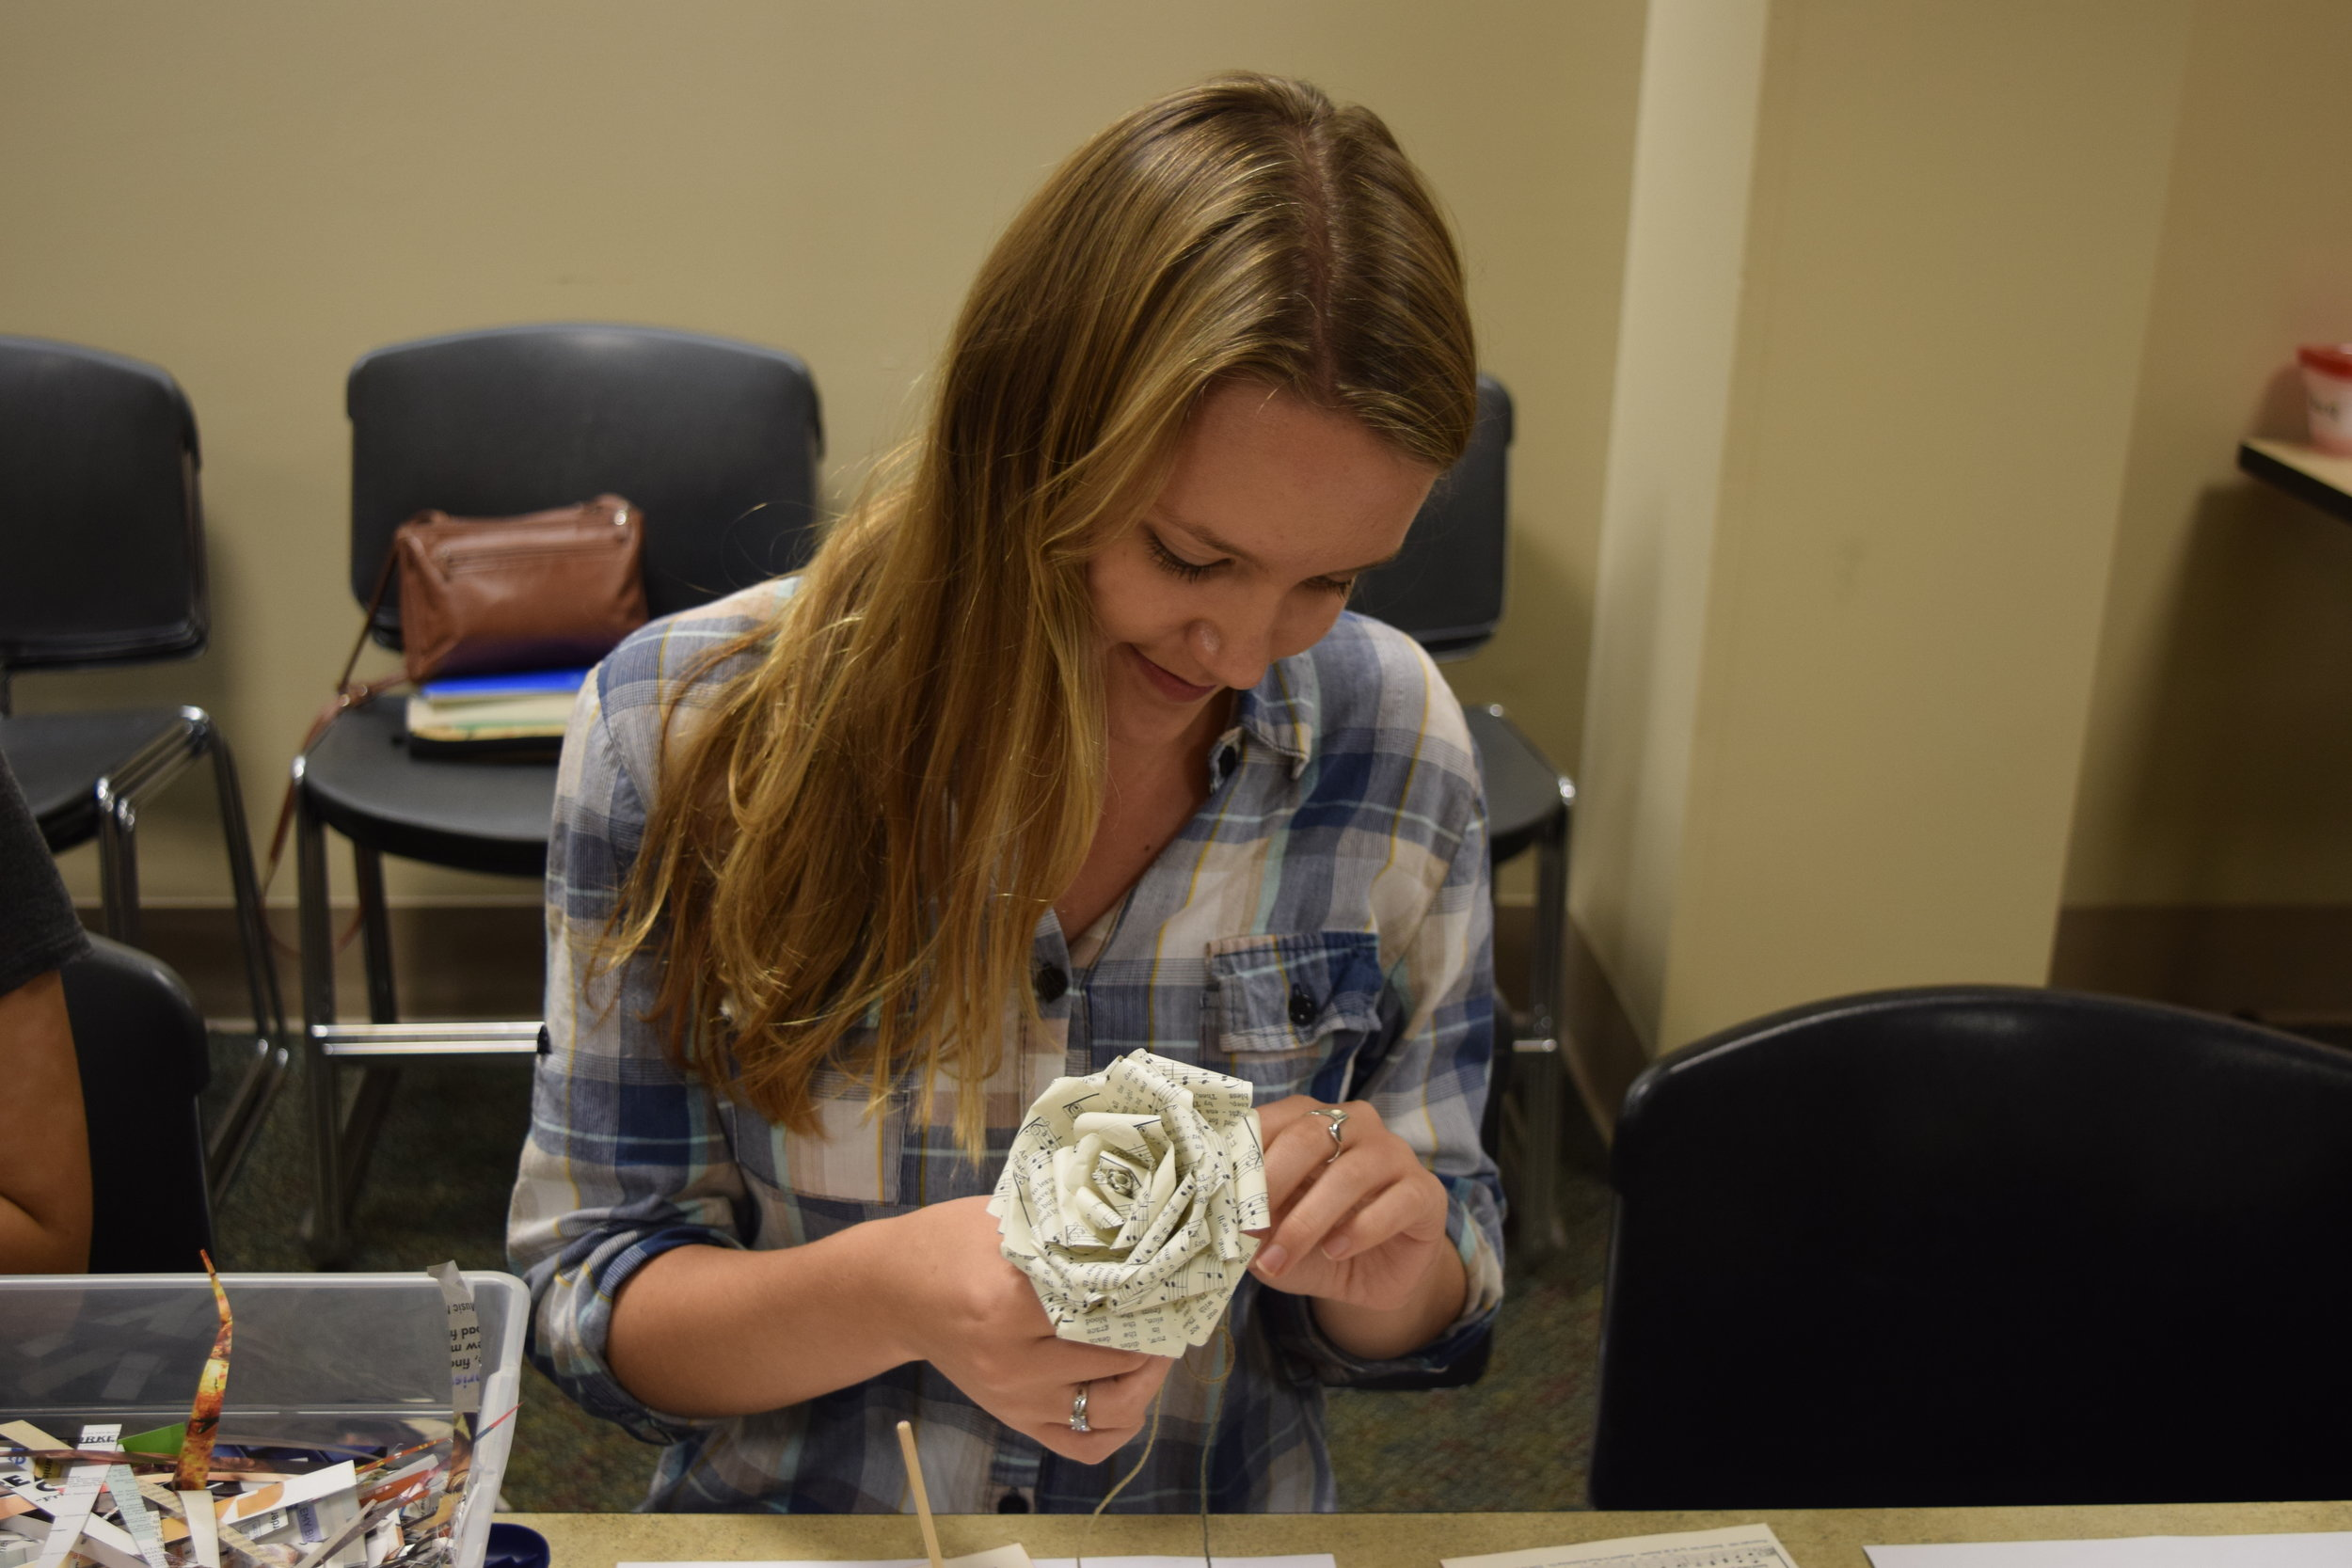 Bridget Pierce crafts her paper rose.